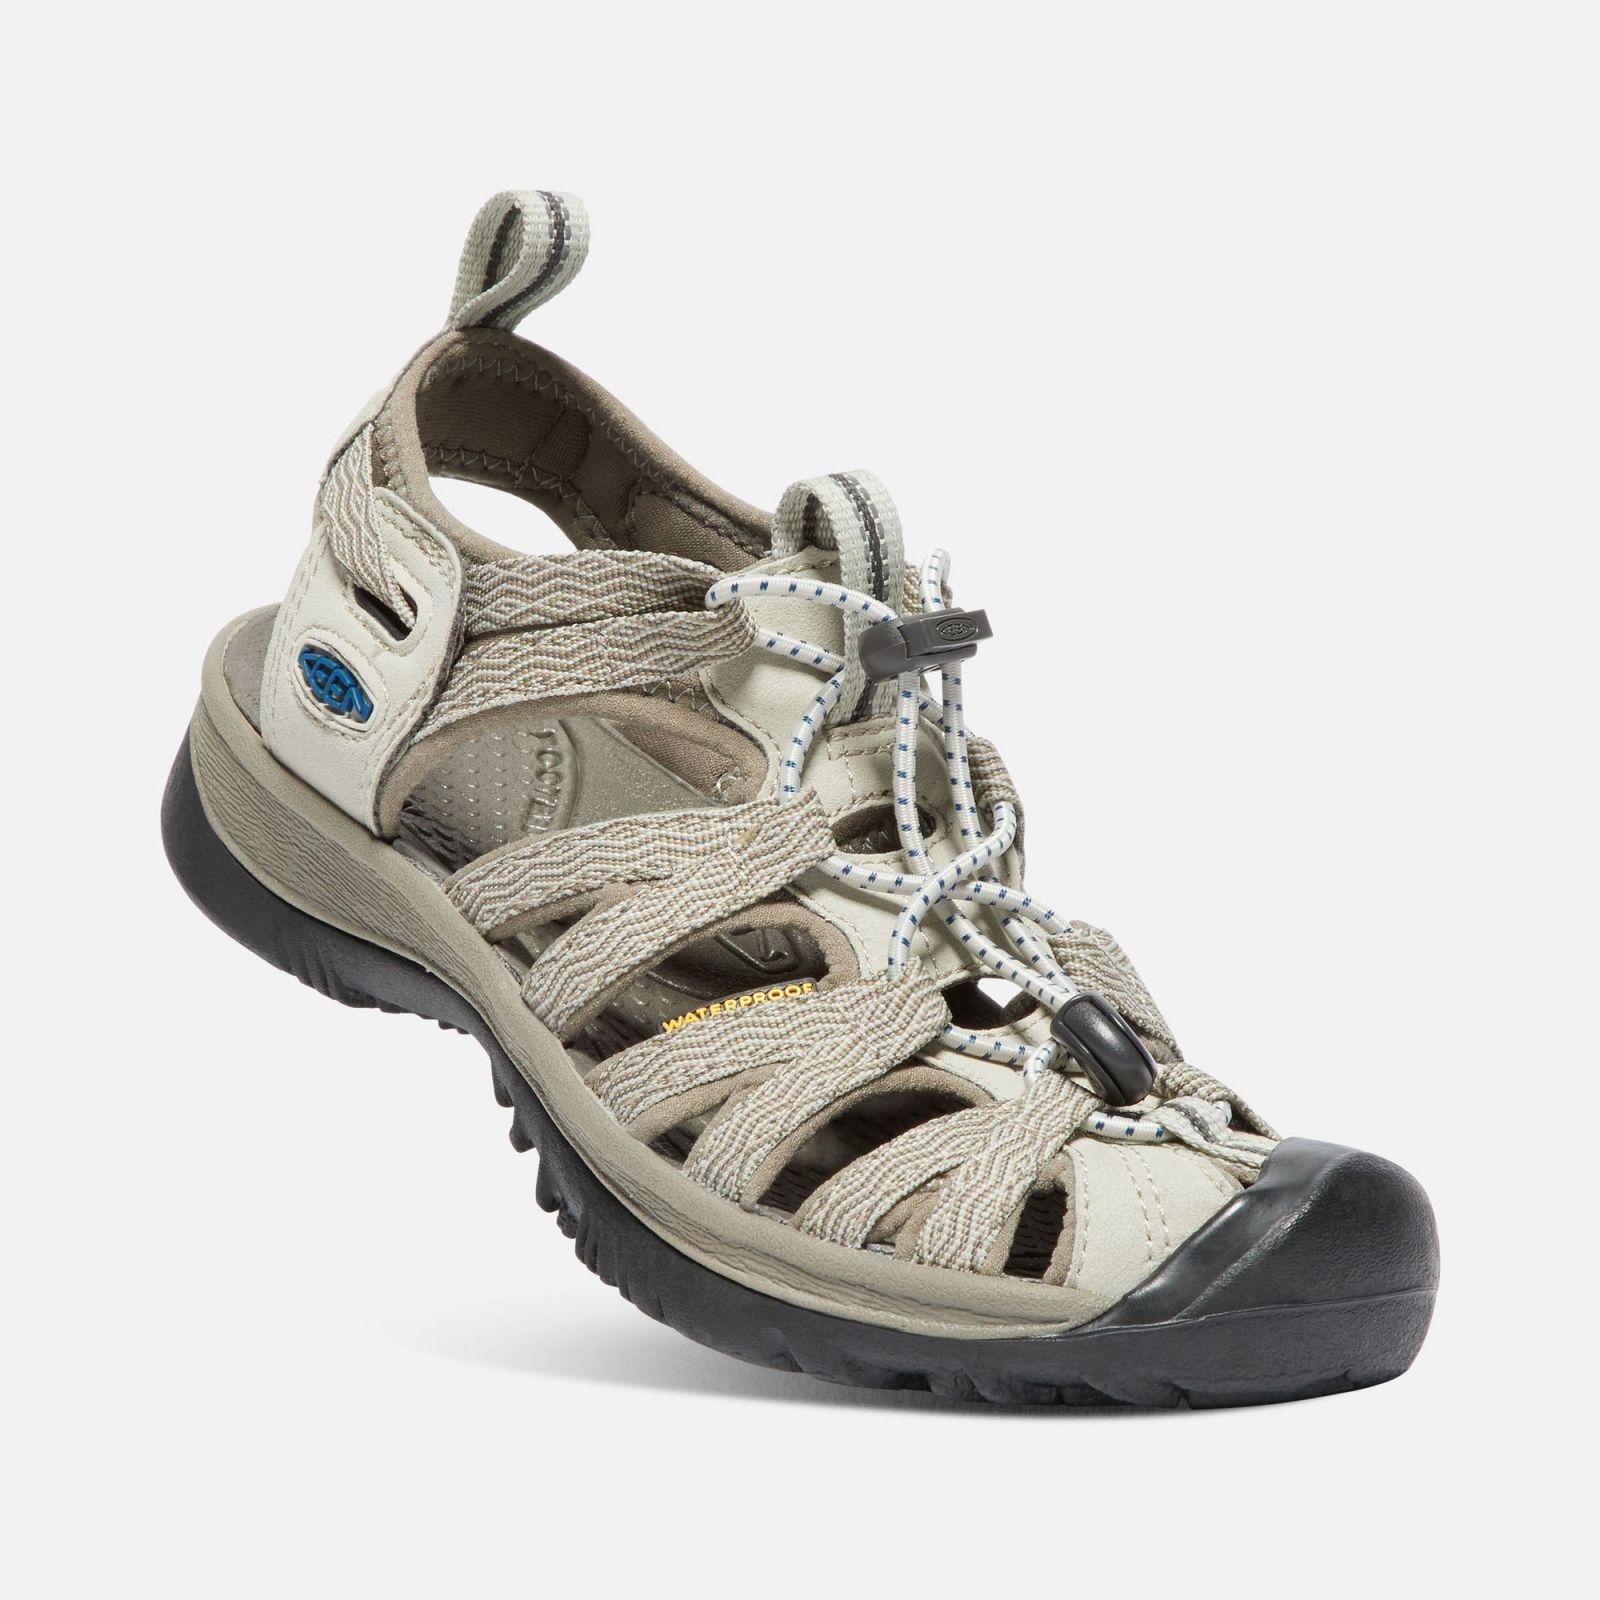 Tazz-Sport - KEEN Whisper W Agate grey / Blue opal dámský sandál